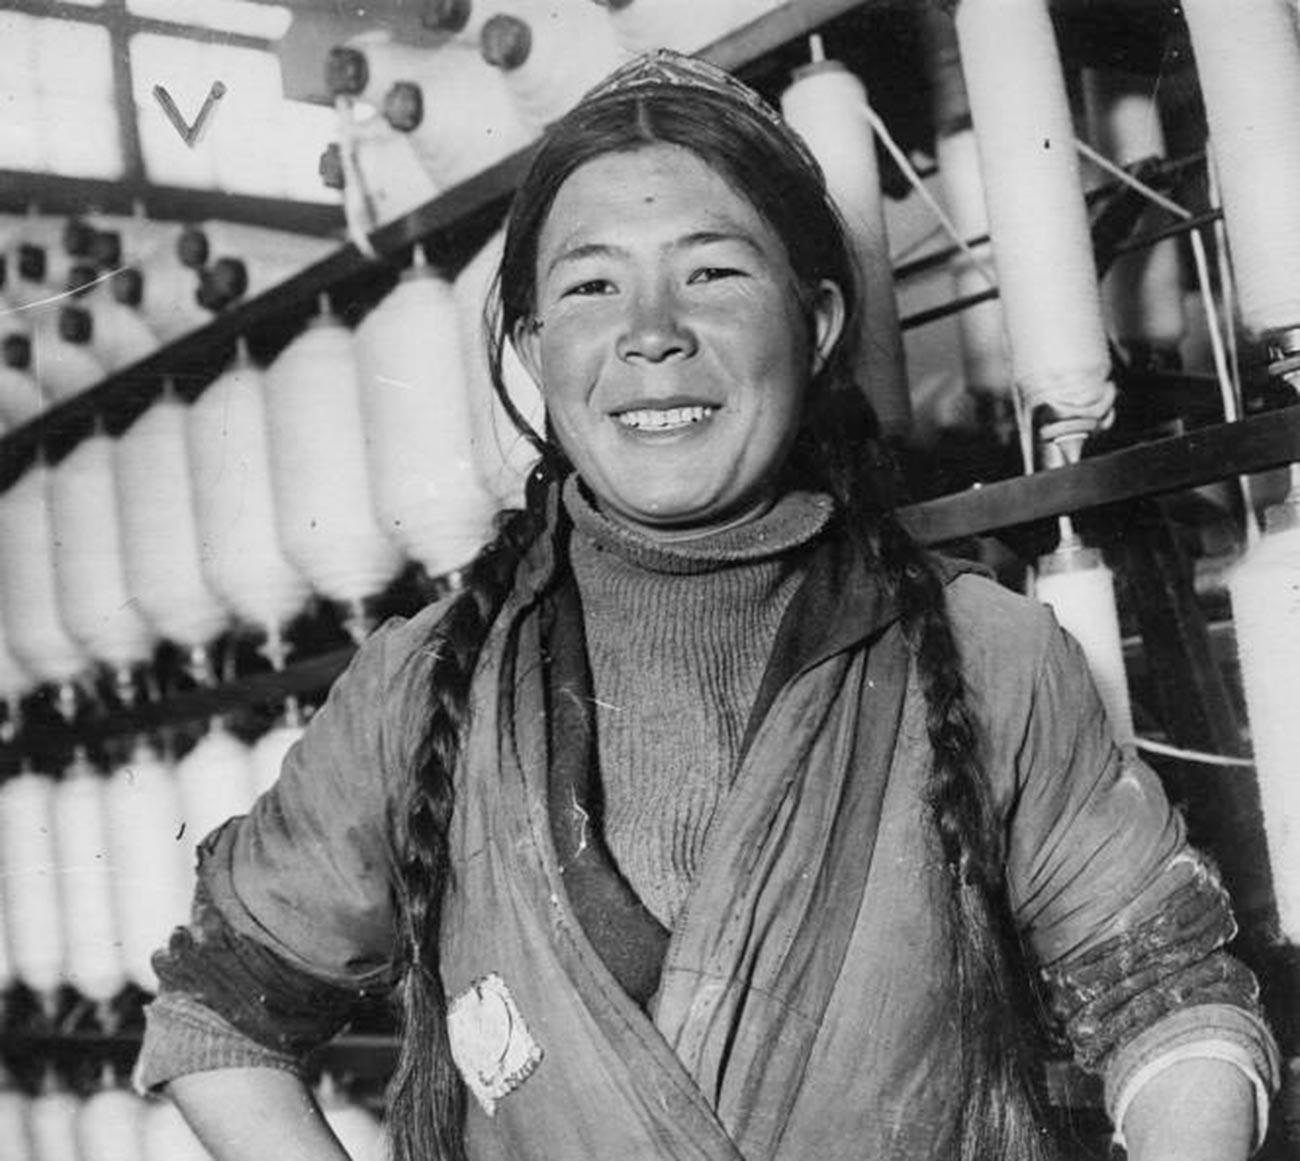 Stakhanovite Gemulin Geledzhiyeva from the Tajik Republic; 1936.